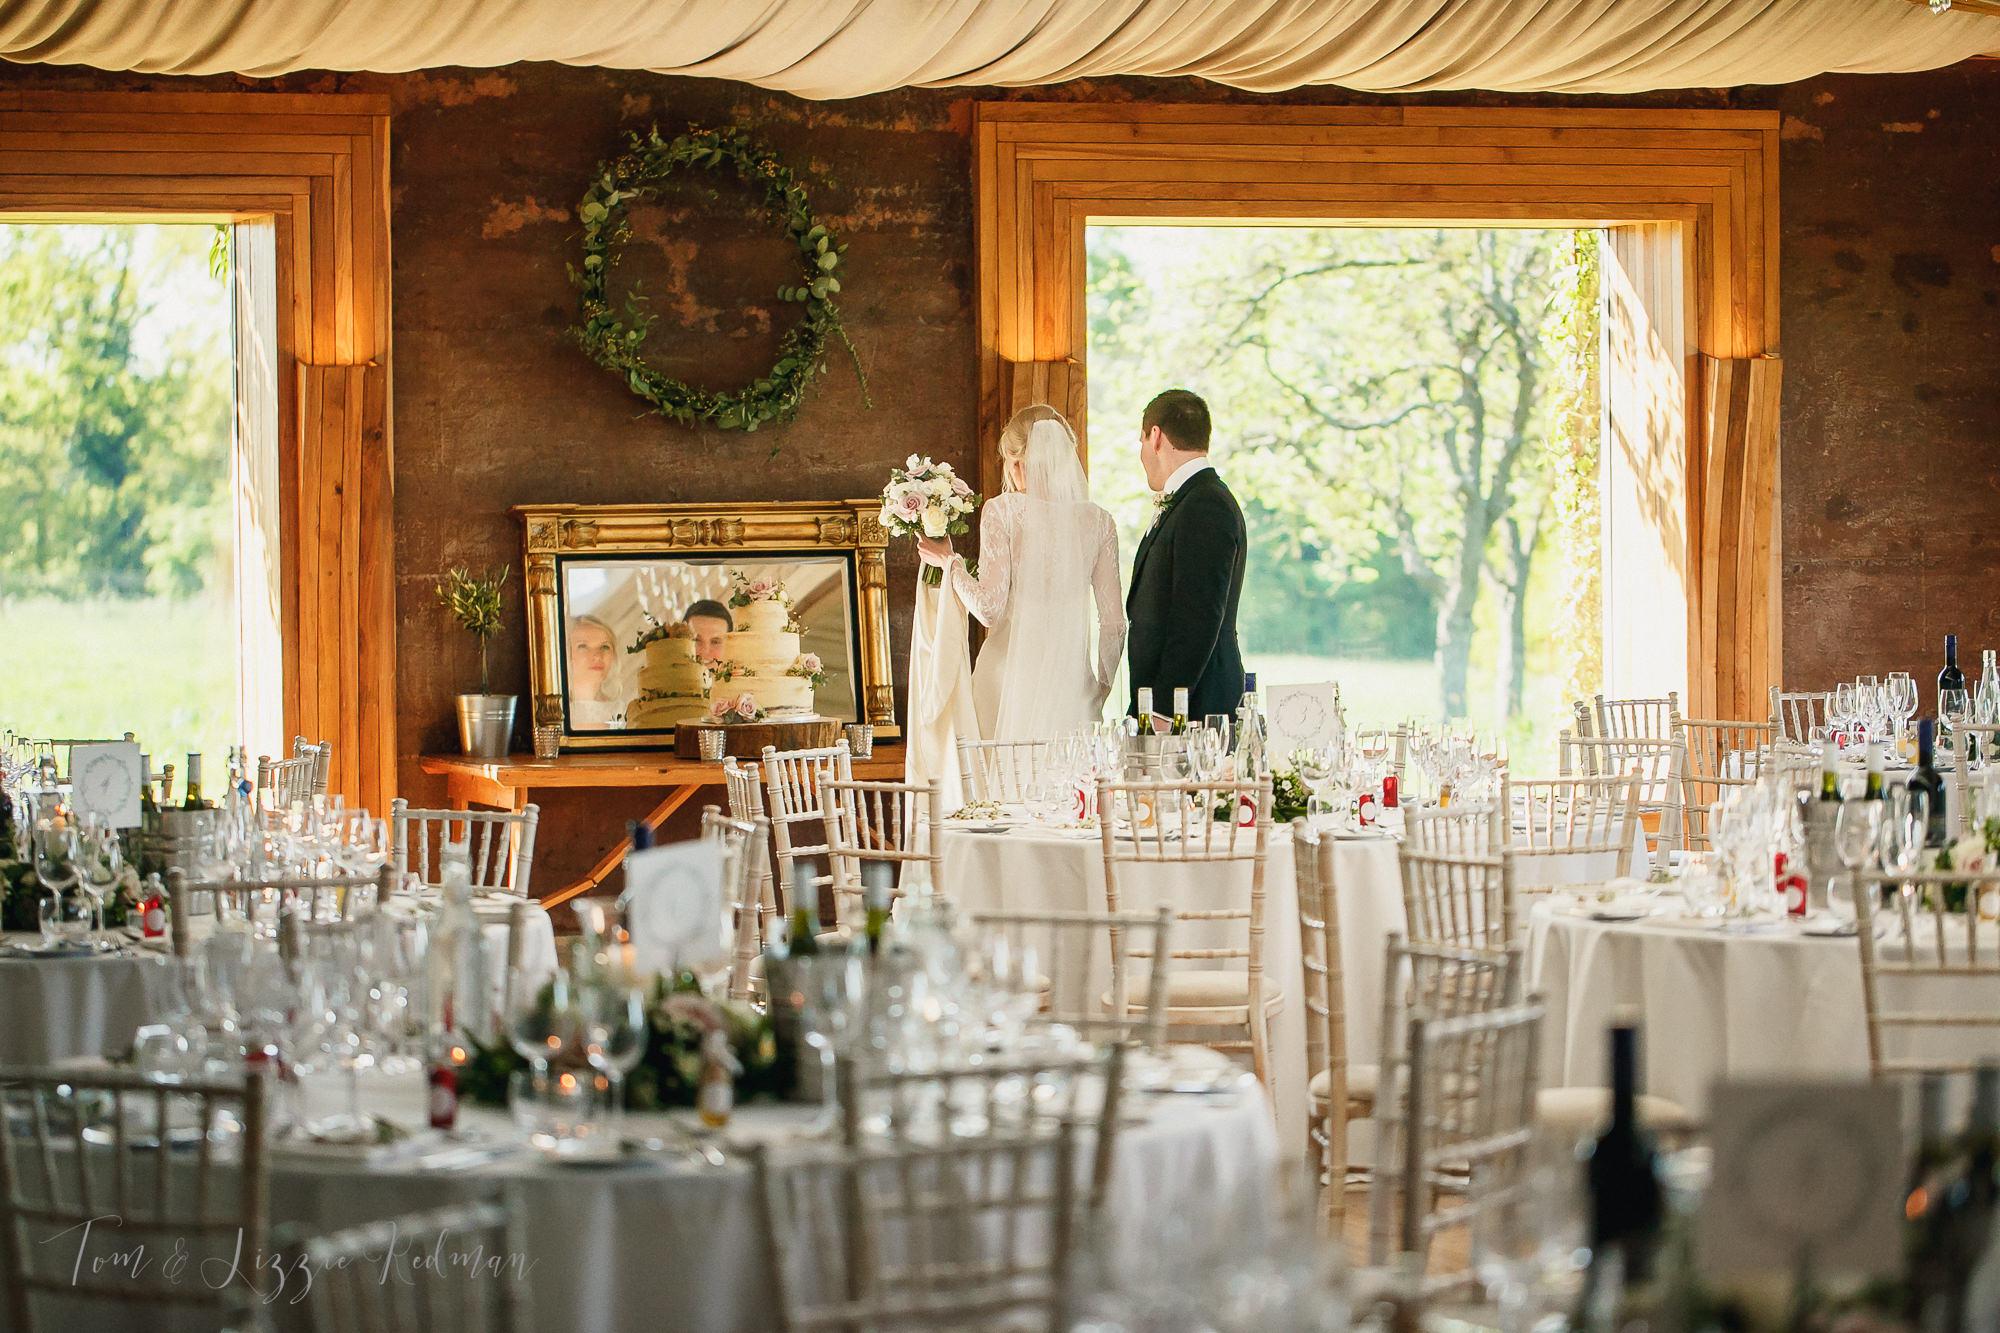 Dorset wedding photographers Tom & Lizzie Redman 035.jpg